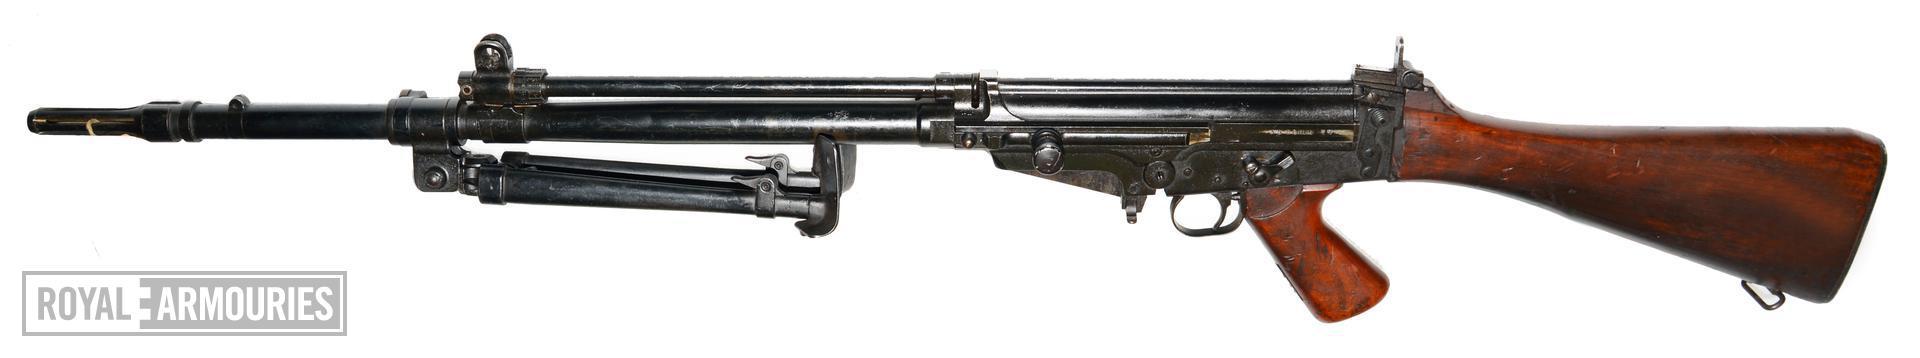 Centrefire automatic rifle - FN X8E6 Experimental